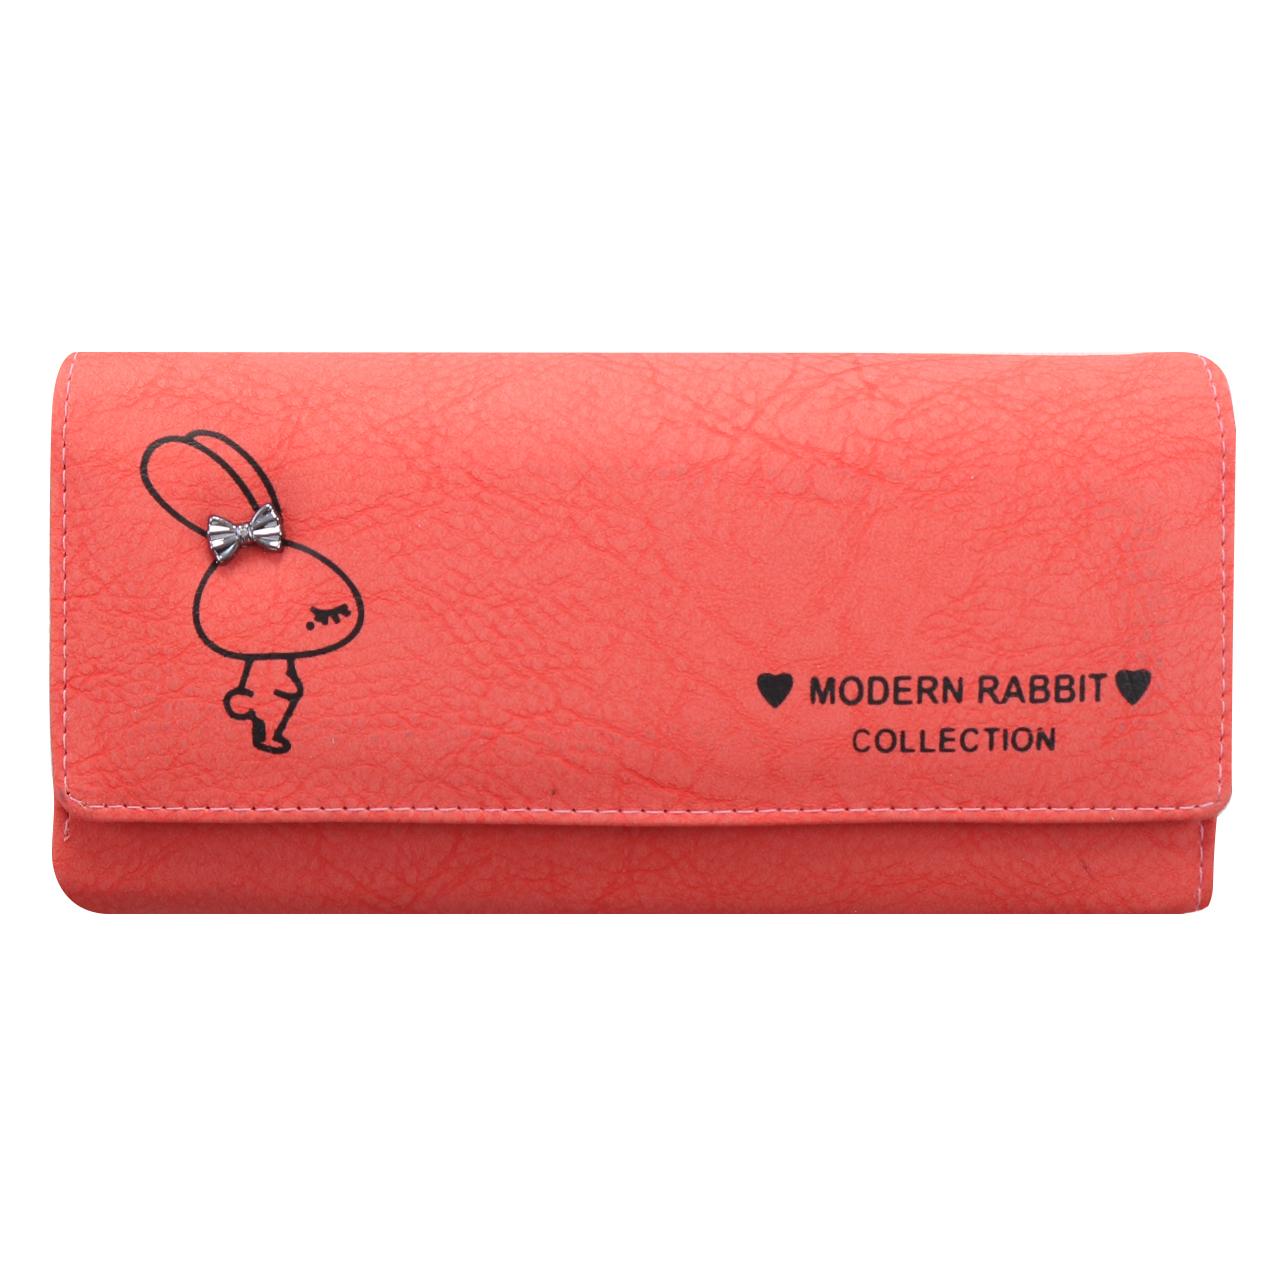 کیف پول زنانه طرح خرگوش کد BG 33 main 1 11